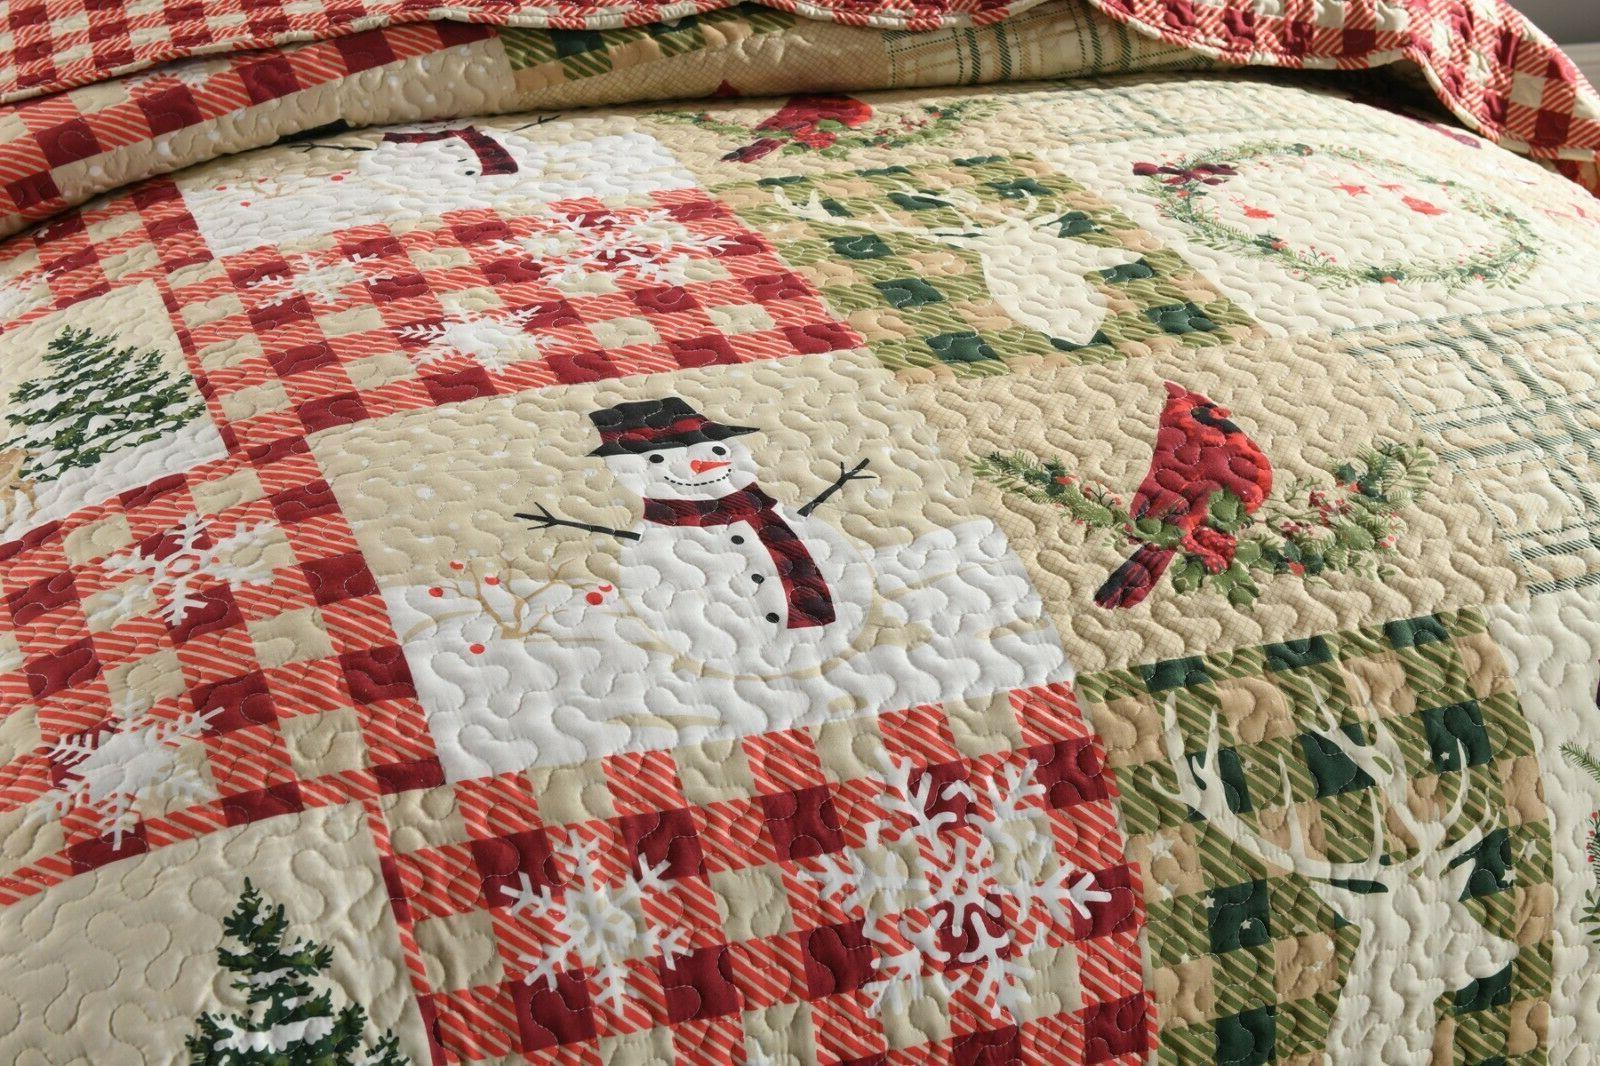 3 Christmas Rustic Lodge Bedspread Set Snow Man